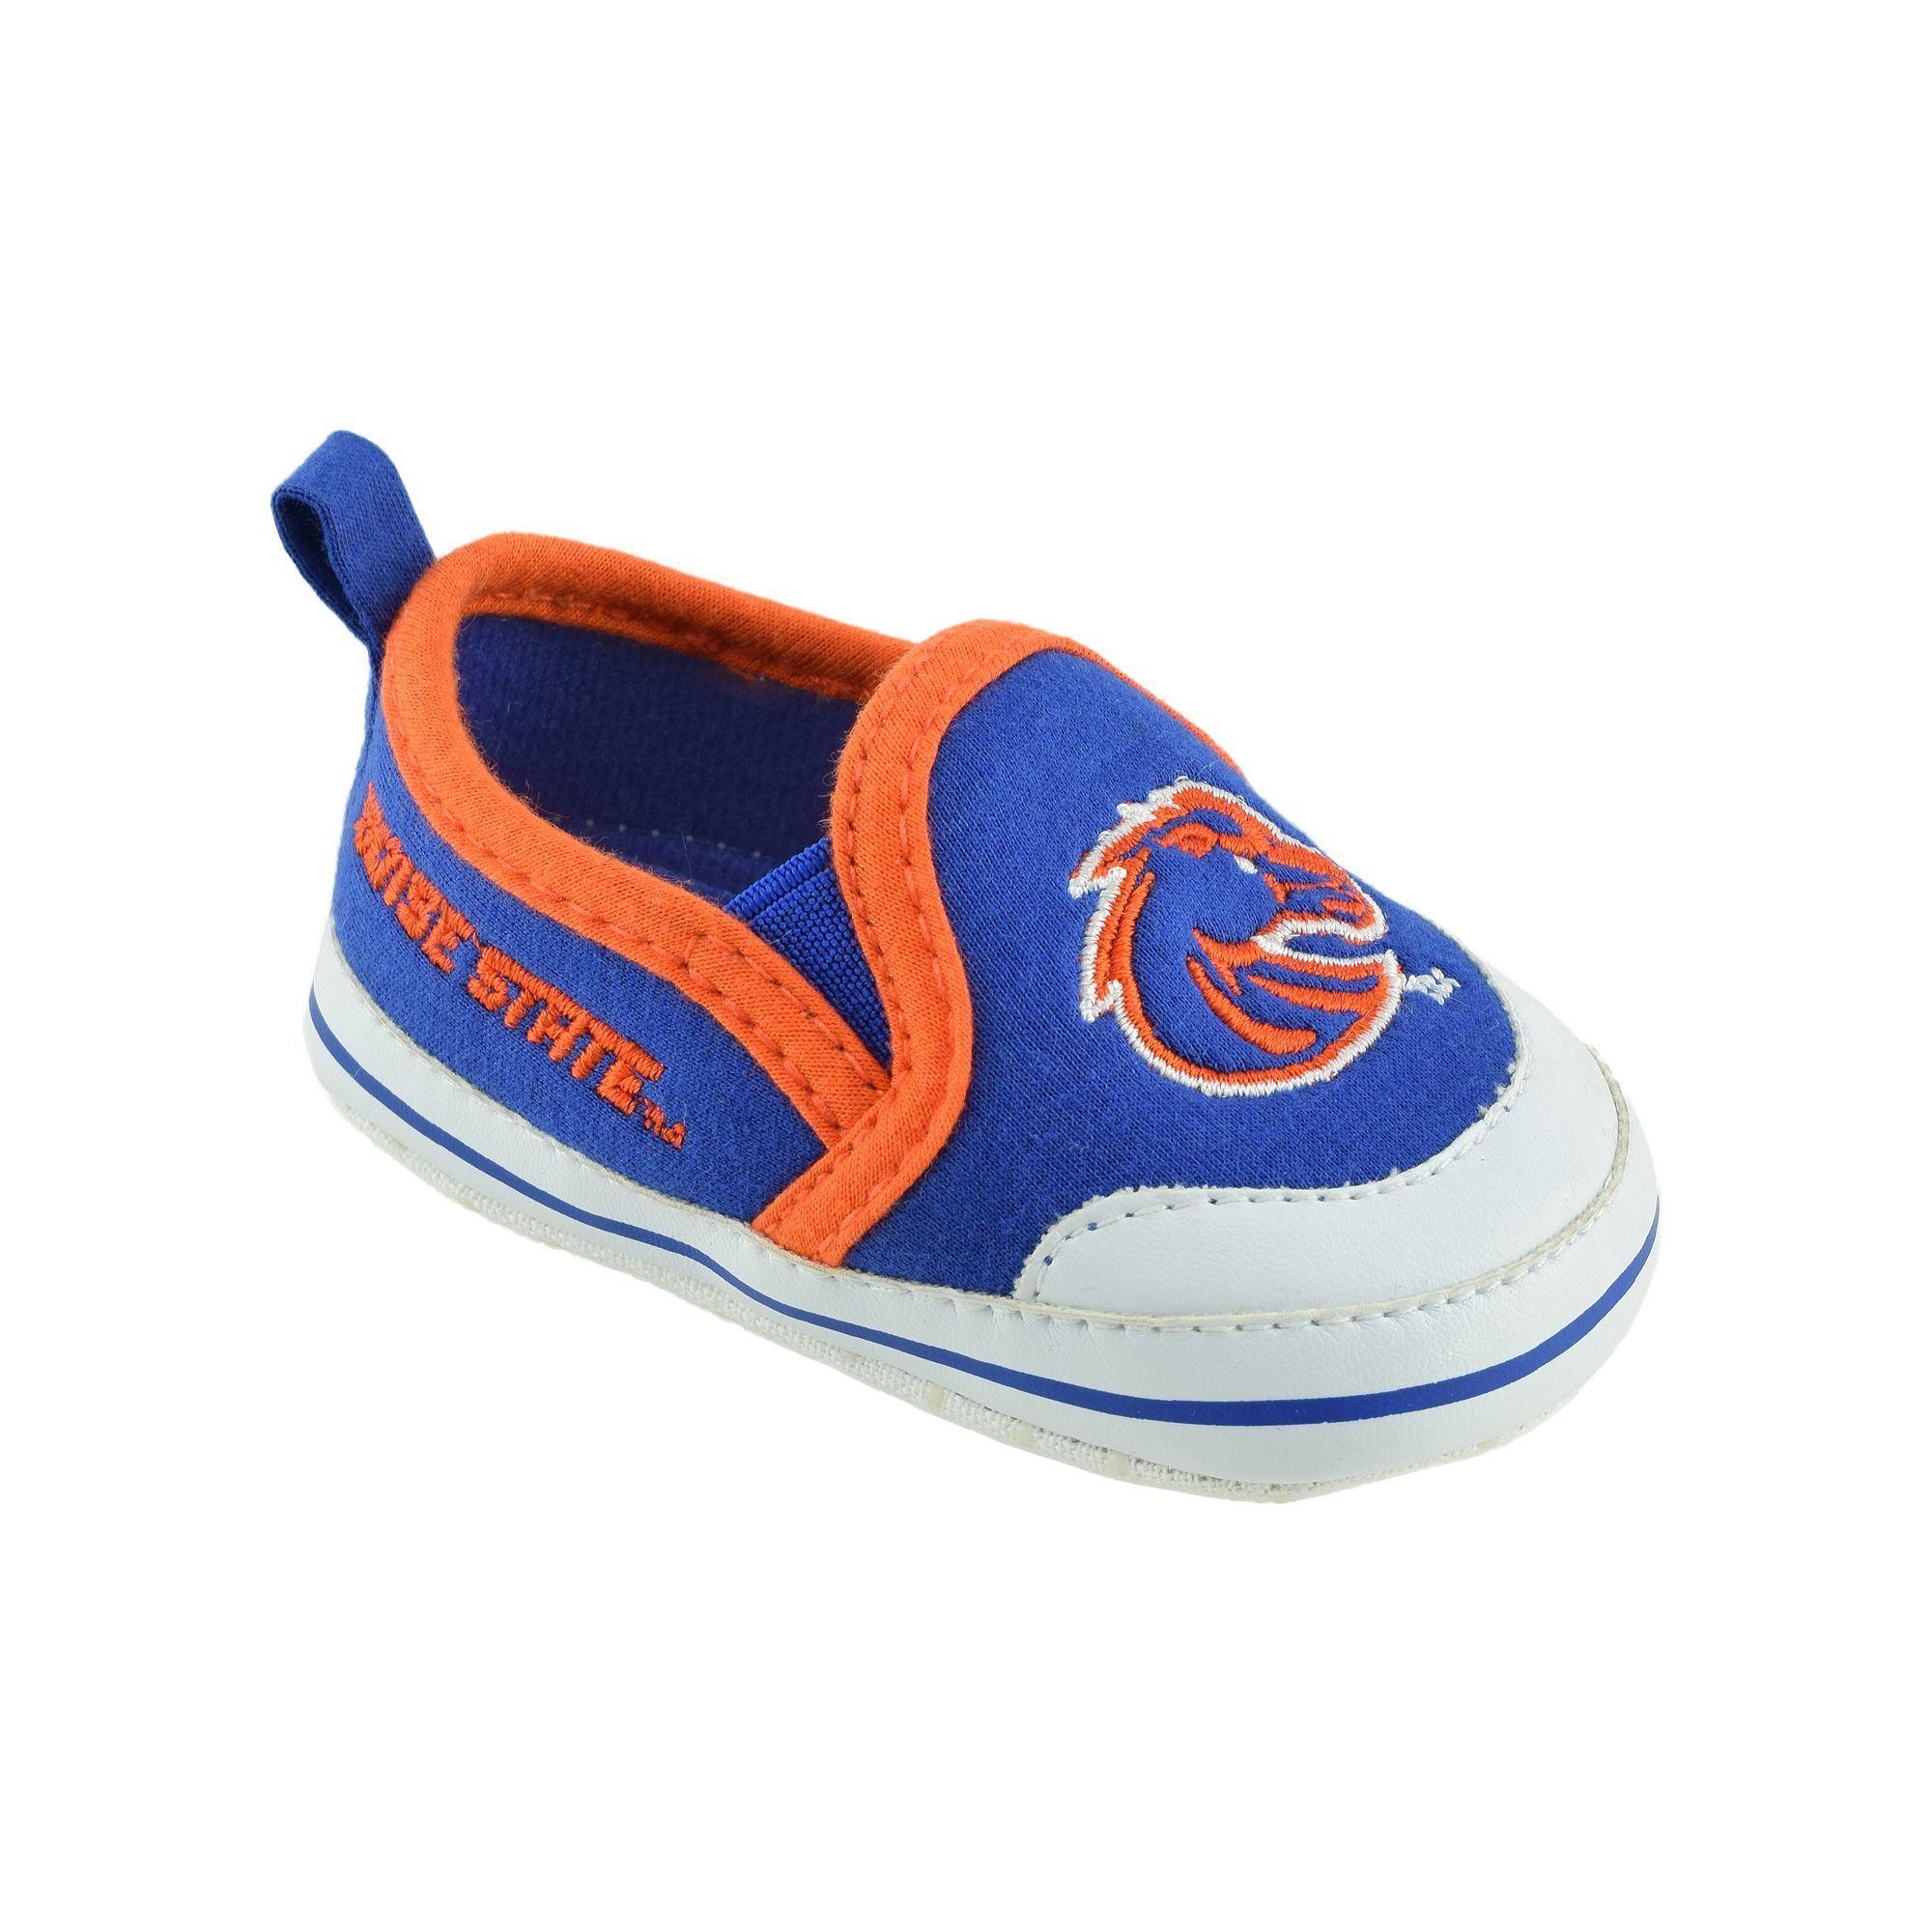 Baby Boise State Broncos Crib Shoes Infant Uni Size 9 12